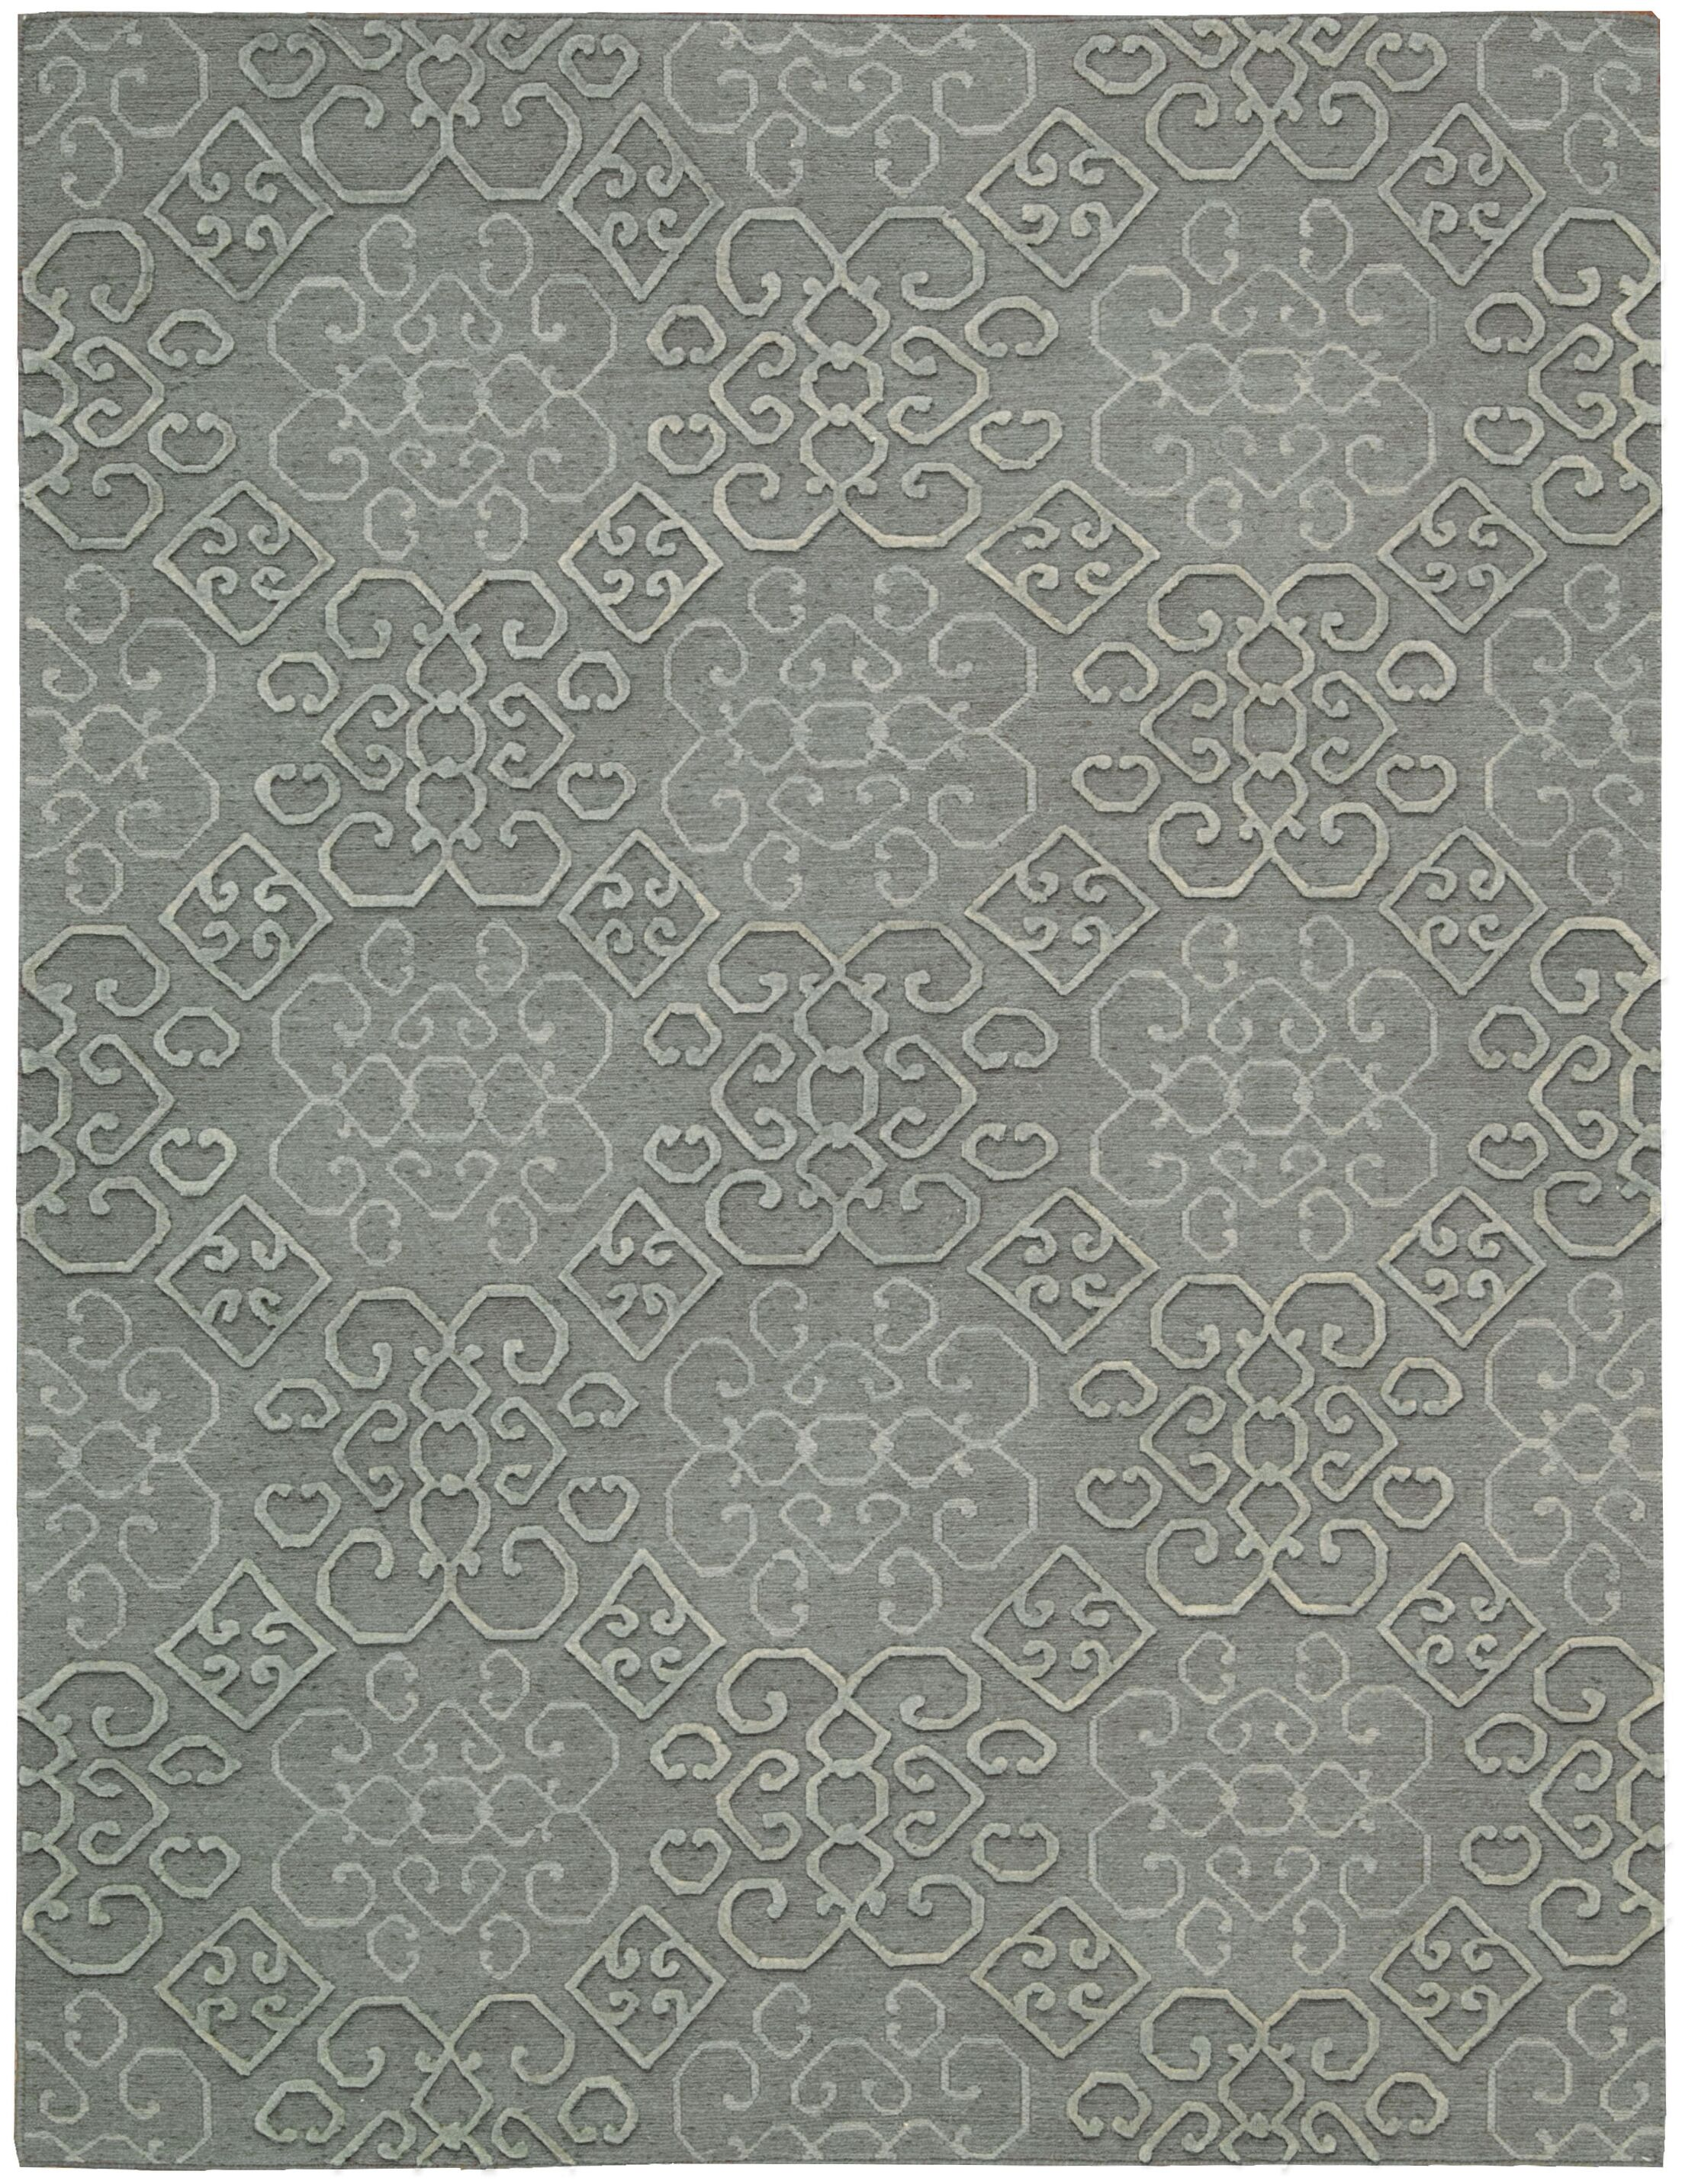 Cedarwood Hand-Woven Slate Area Rug Rug Size: Rectangle 5'6